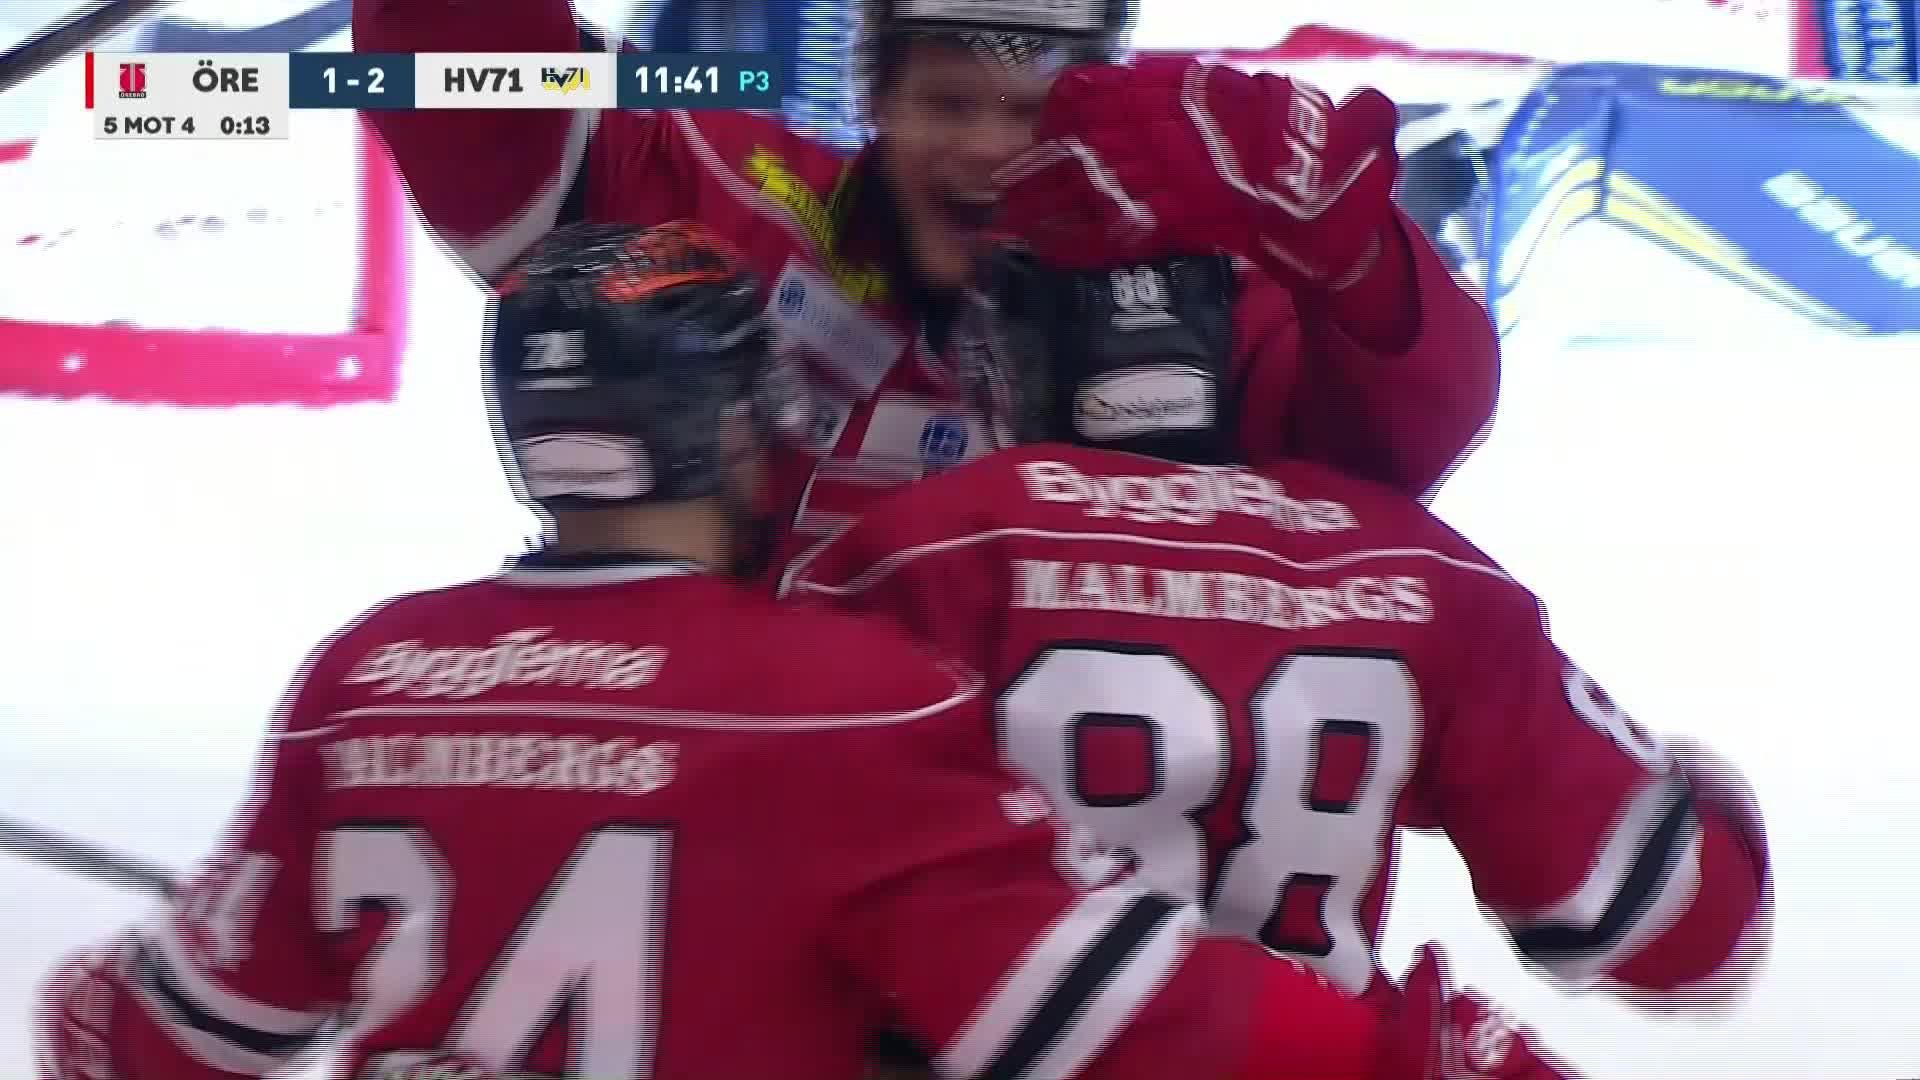 Örebro Hockey - HV71 1-2